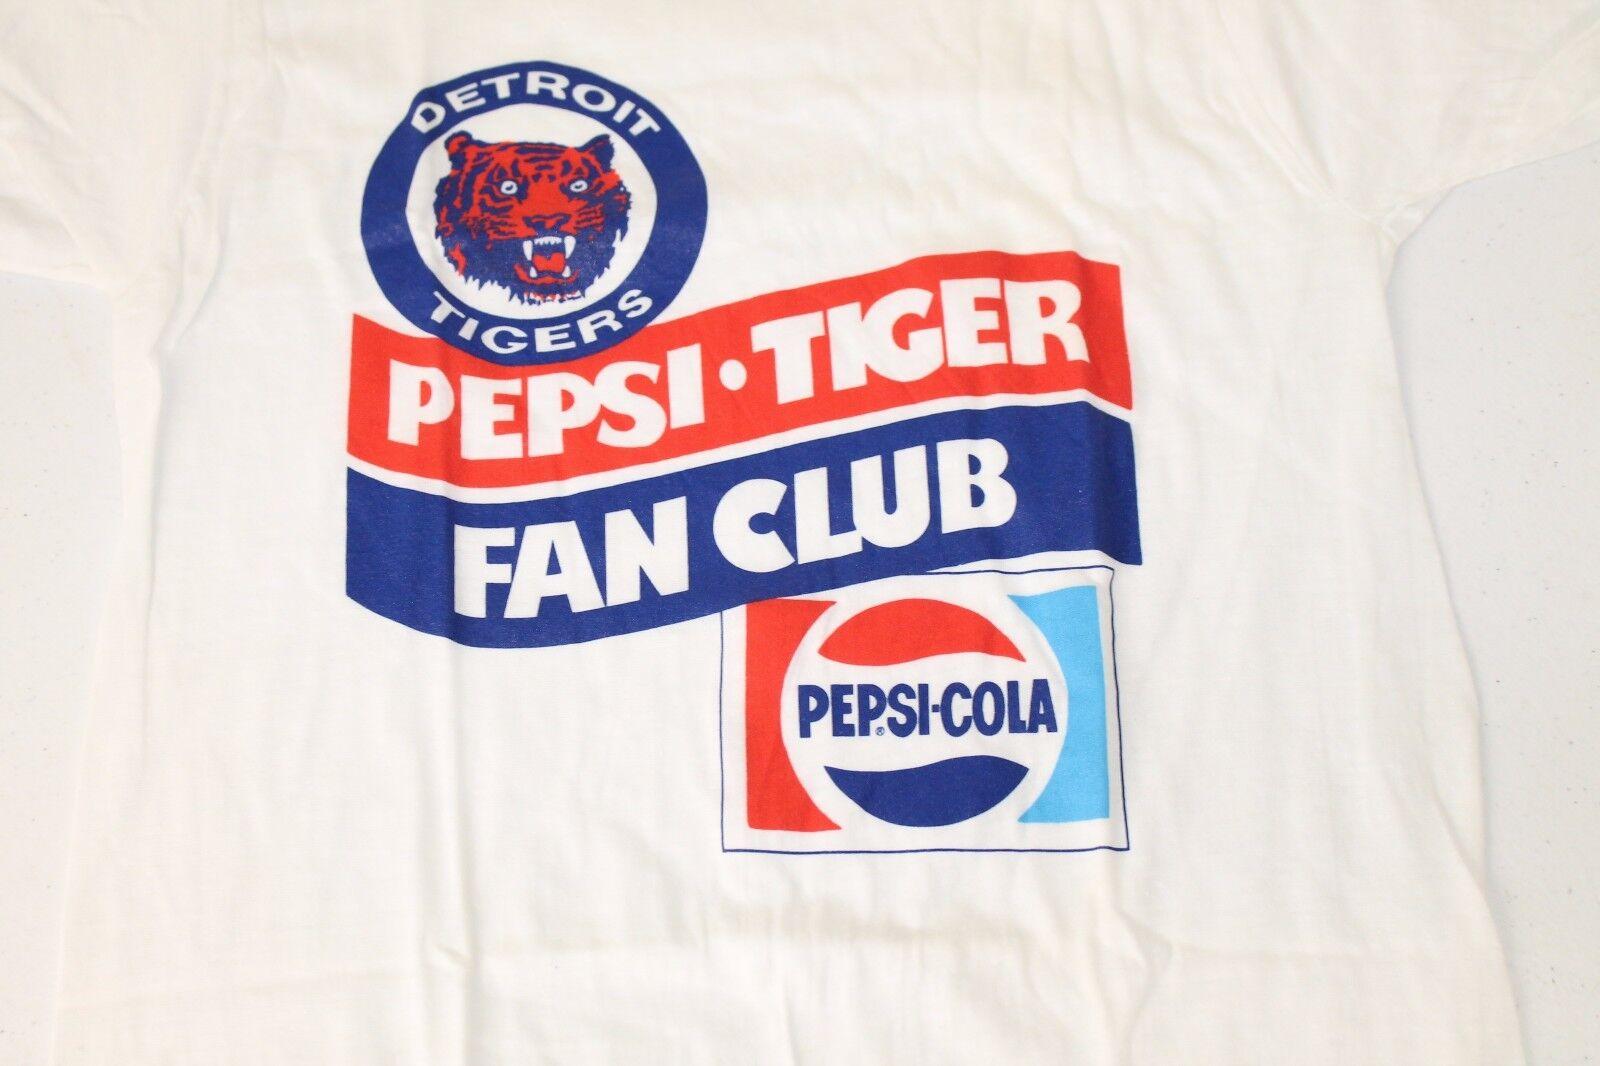 Original Vintage 70's PEPSI COLA Detroit Tigers Fan Club T-SHIRT Sz Small